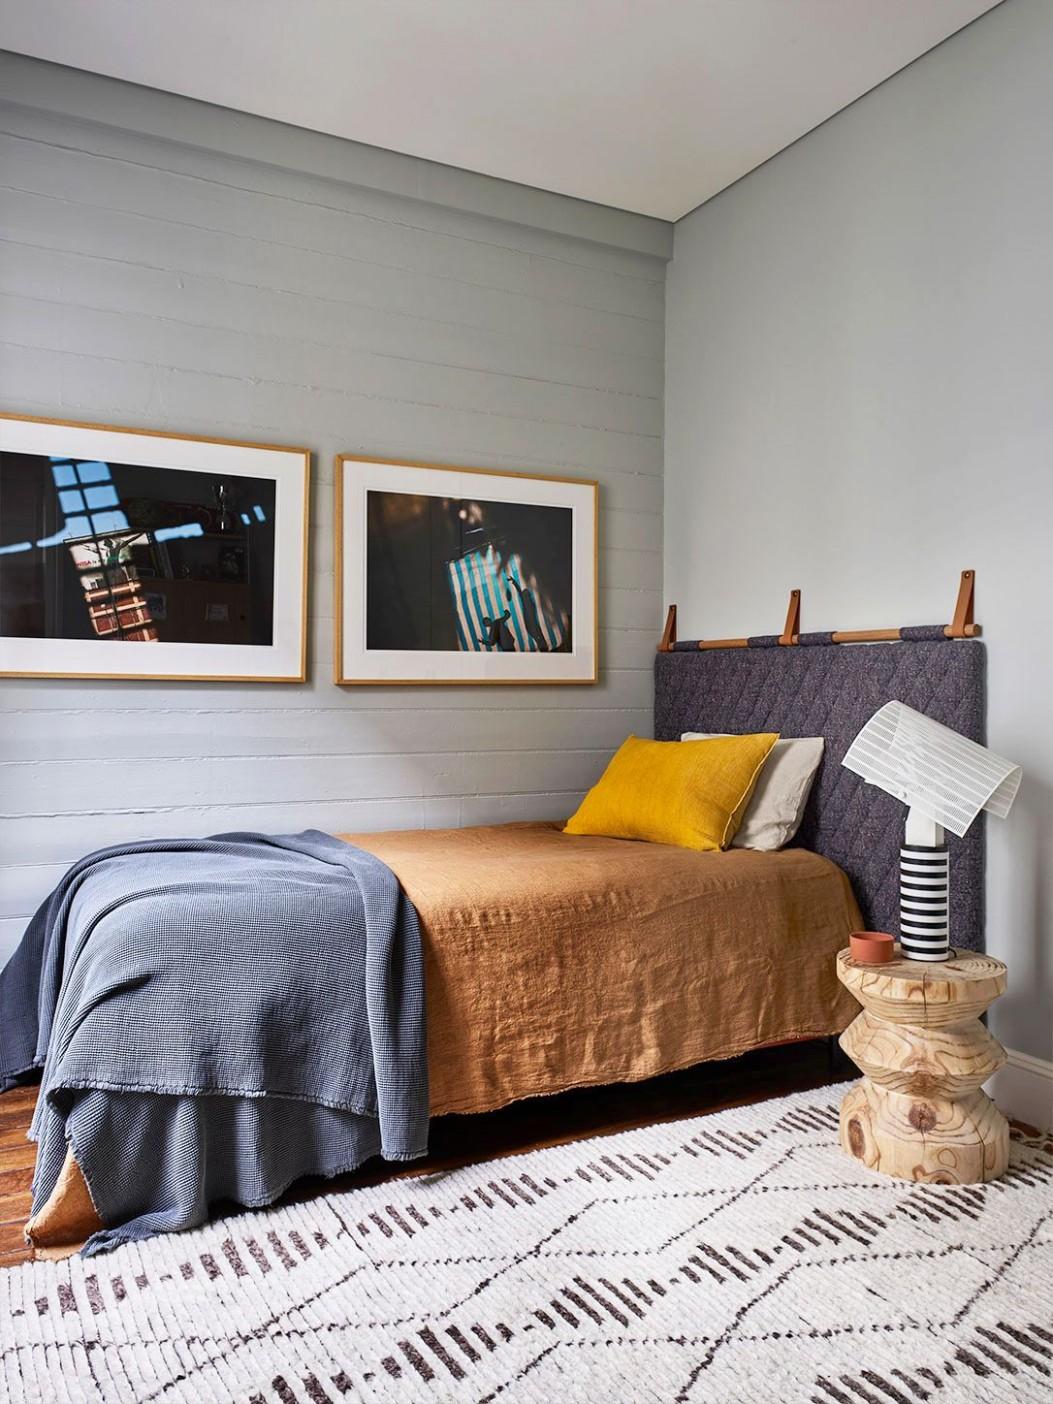 10 Best Boys Bedroom Ideas in 10 - Boys Room Design - Bedroom Ideas Male